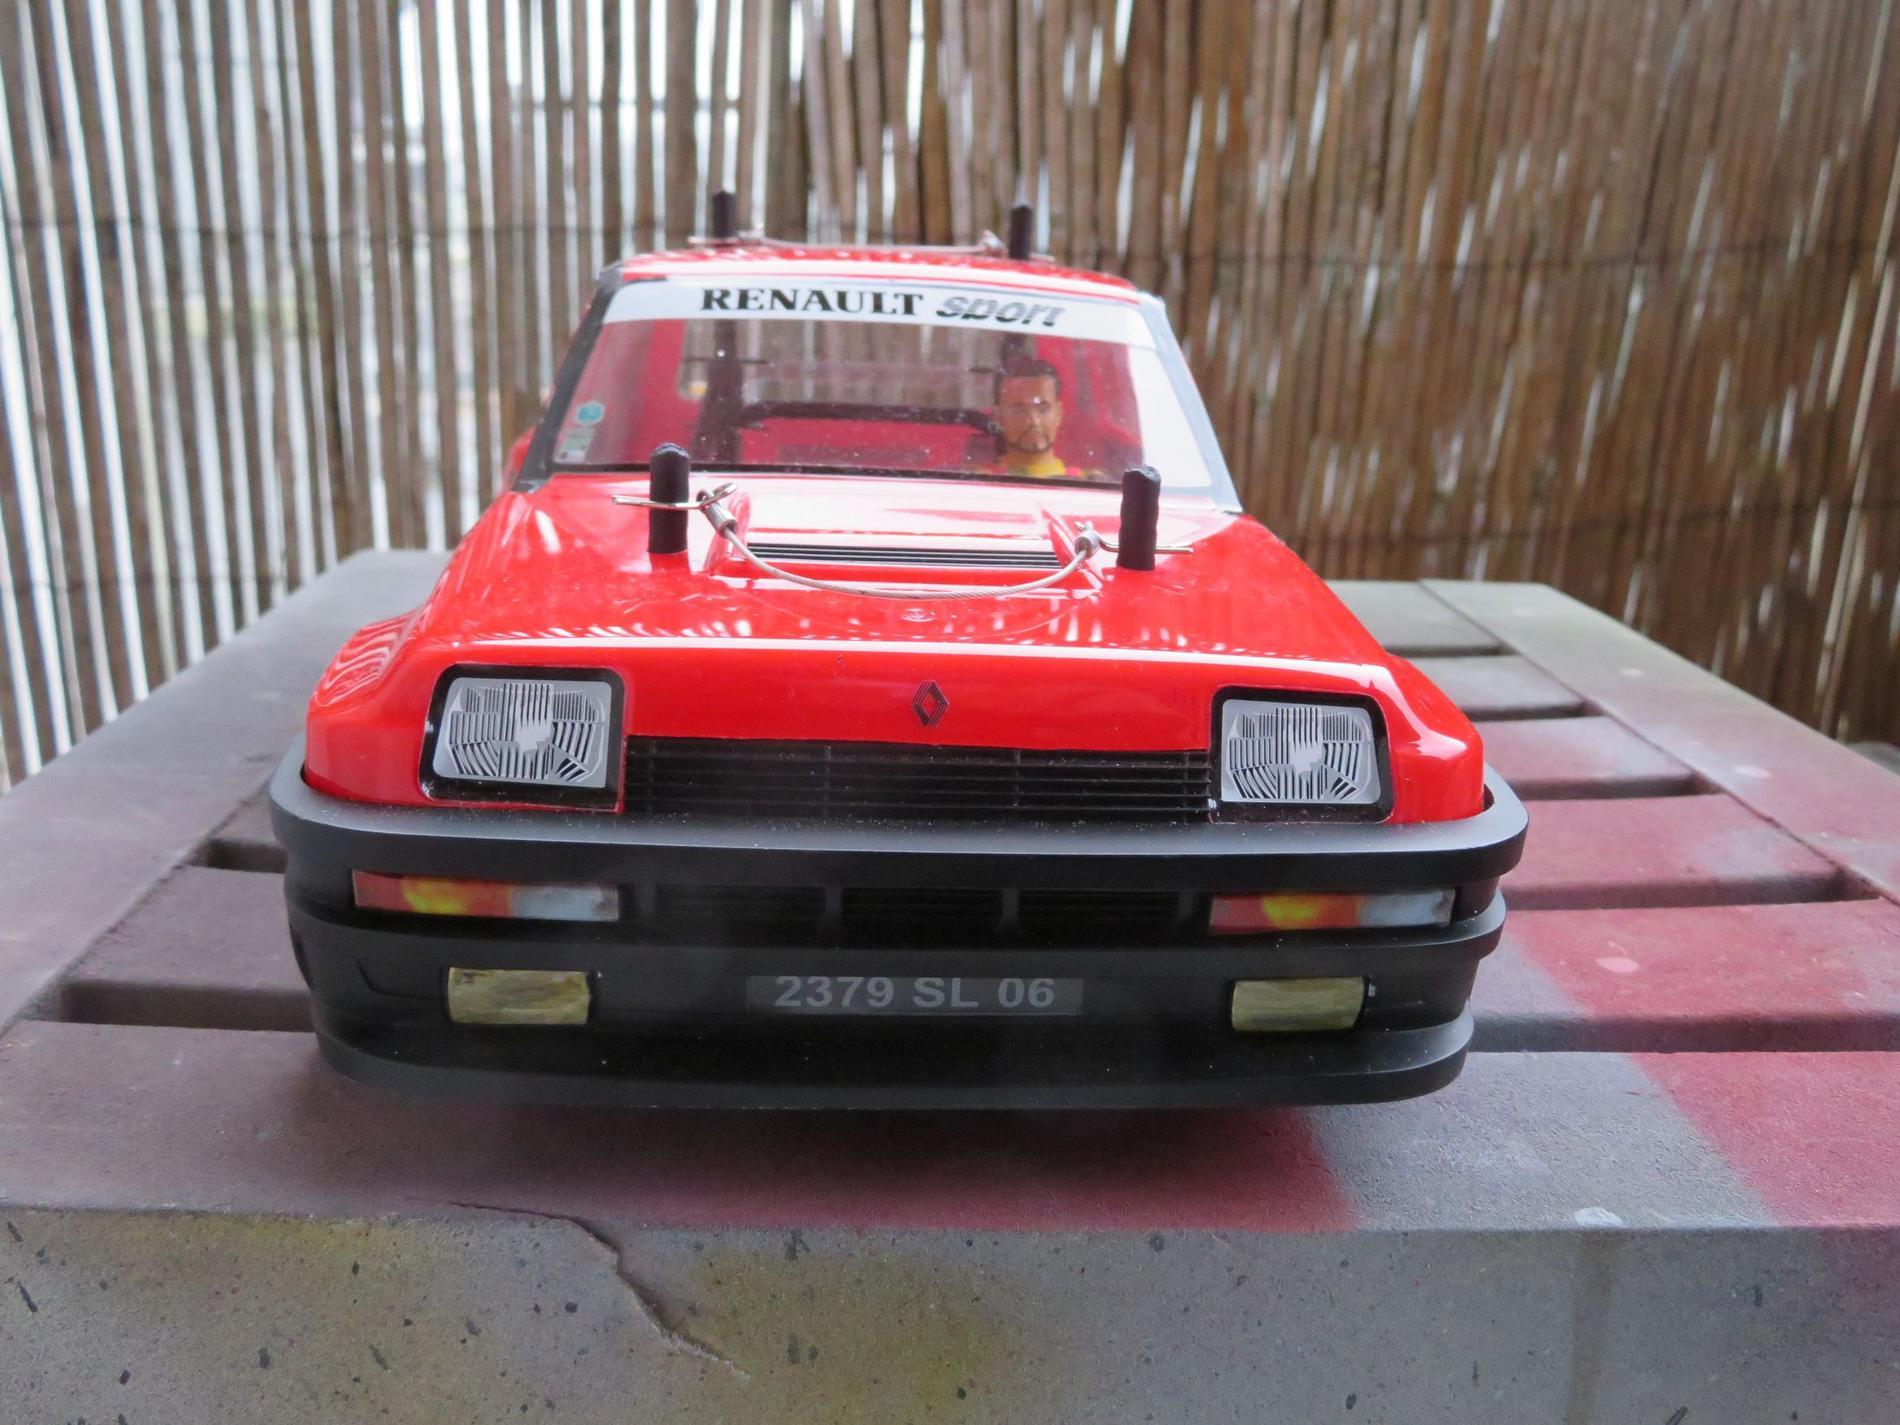 Tamiya Renault 5 Turbo - M08 Concept 27246ad8062005fd569c81c3935d3348